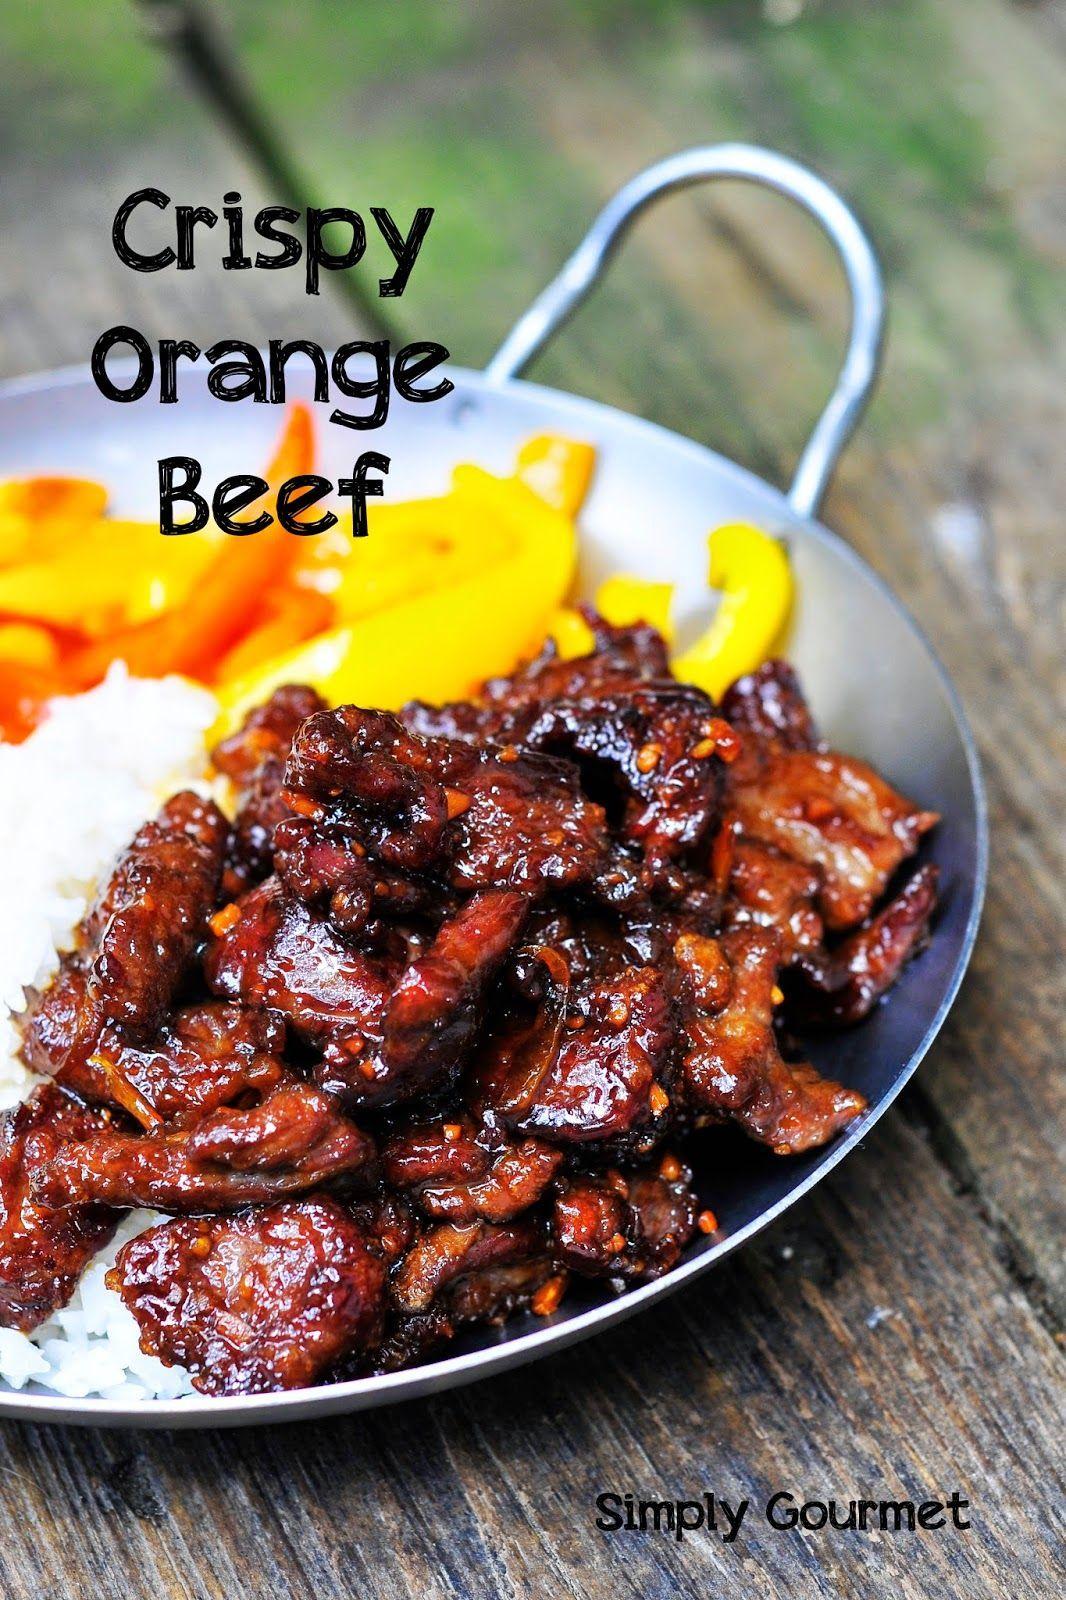 Crispy Orange Beef images